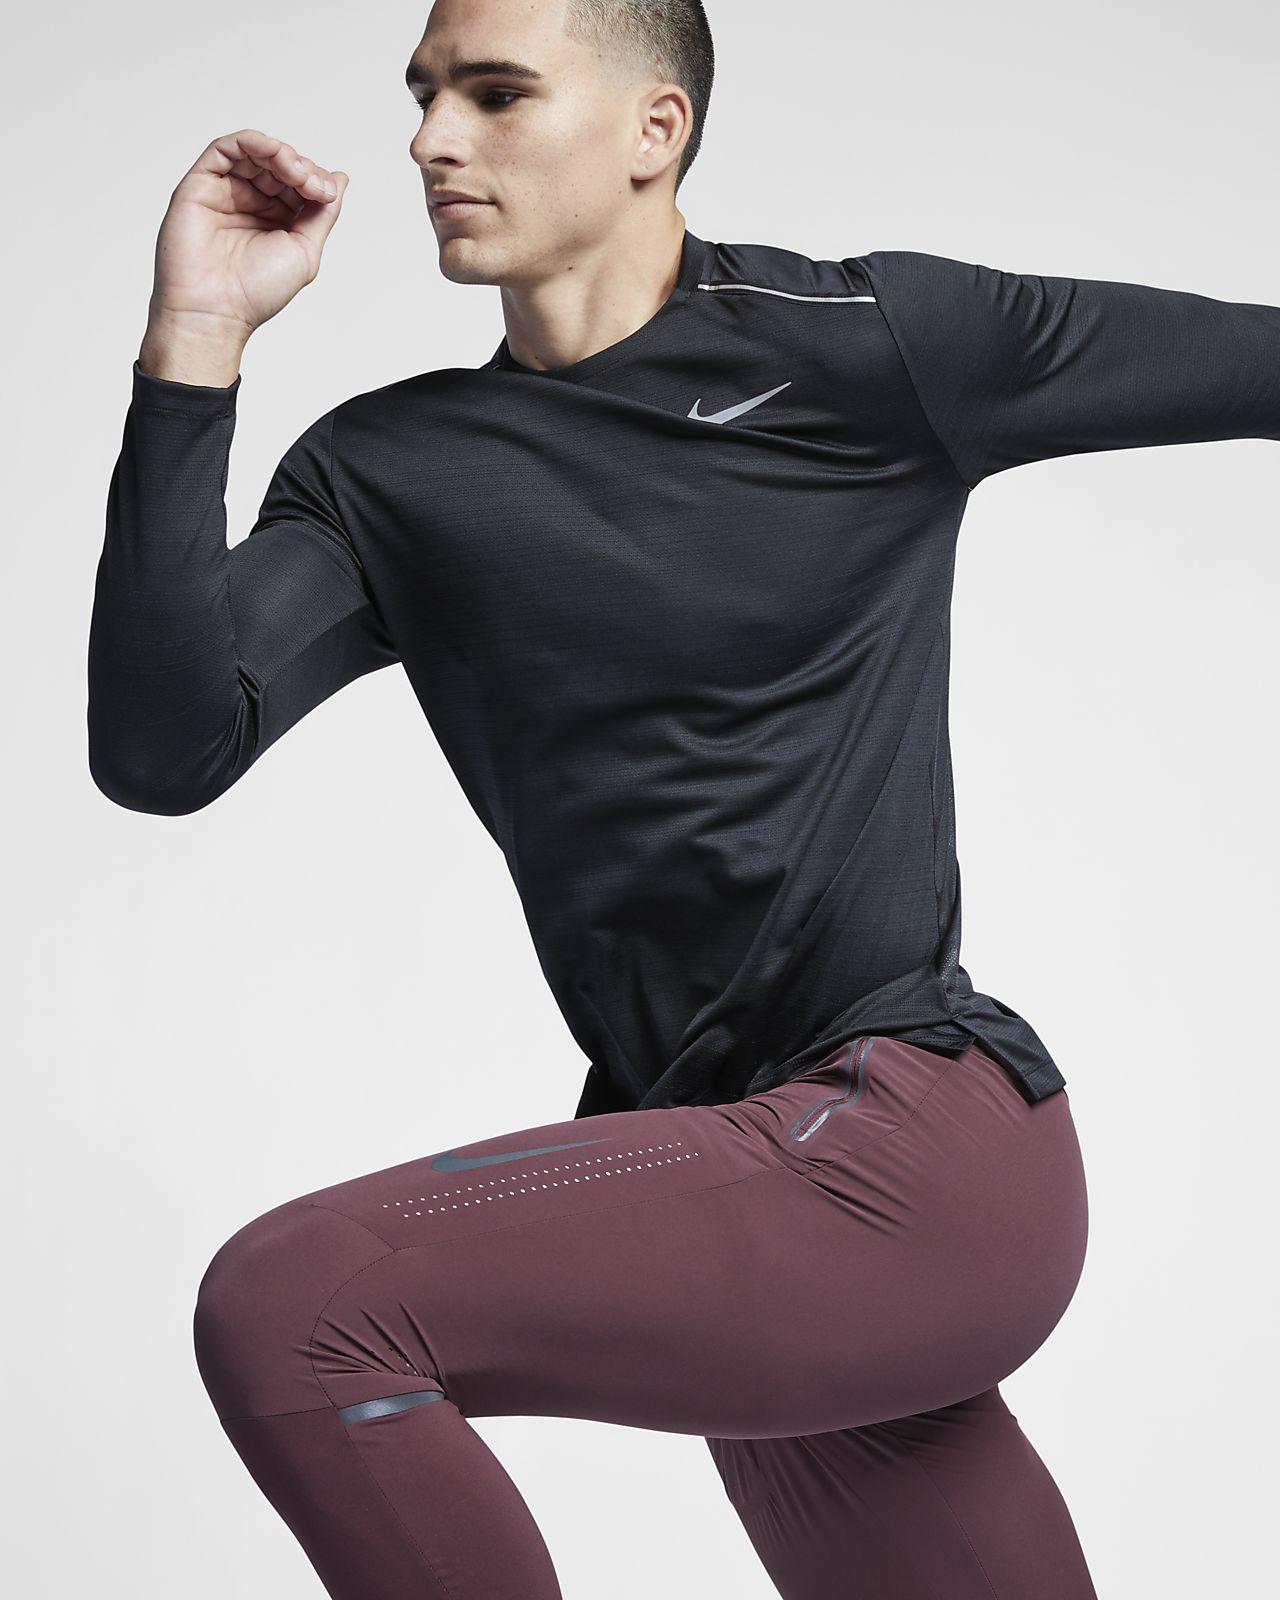 Prenda superior de running de manga larga para hombre Nike Dri-FIT Miler